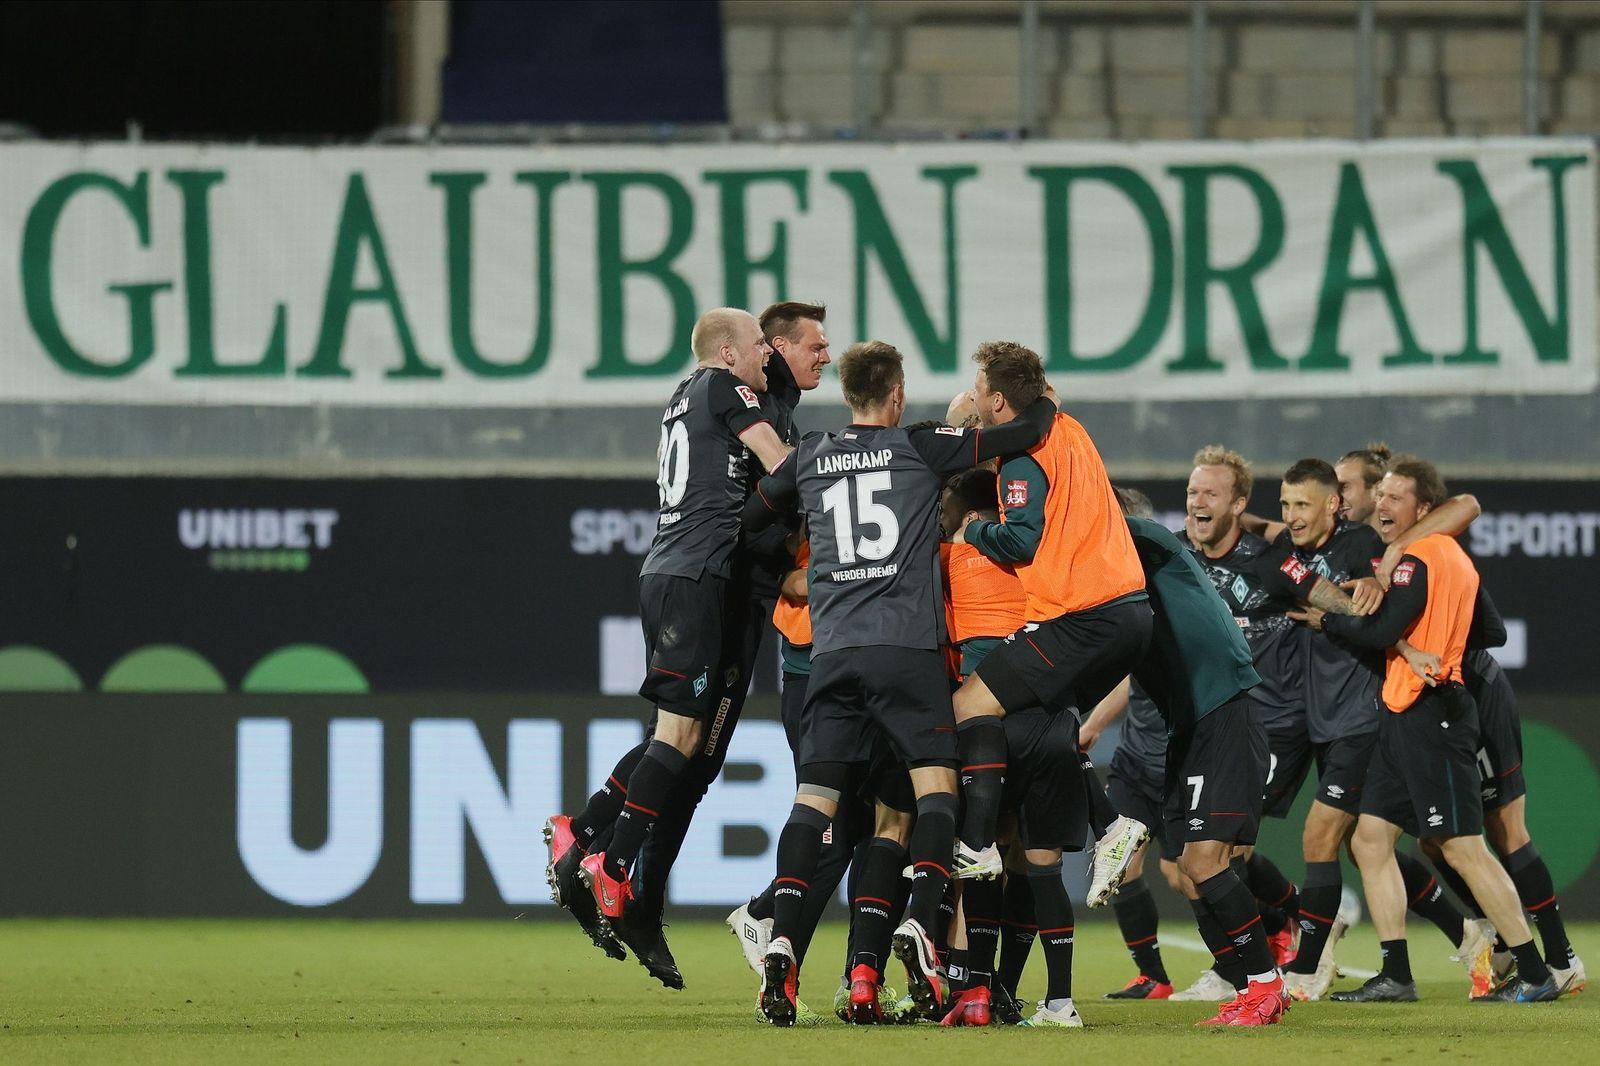 1. FC Heidenheim vs Werder Bremen, Germany - 06 Jul 2020